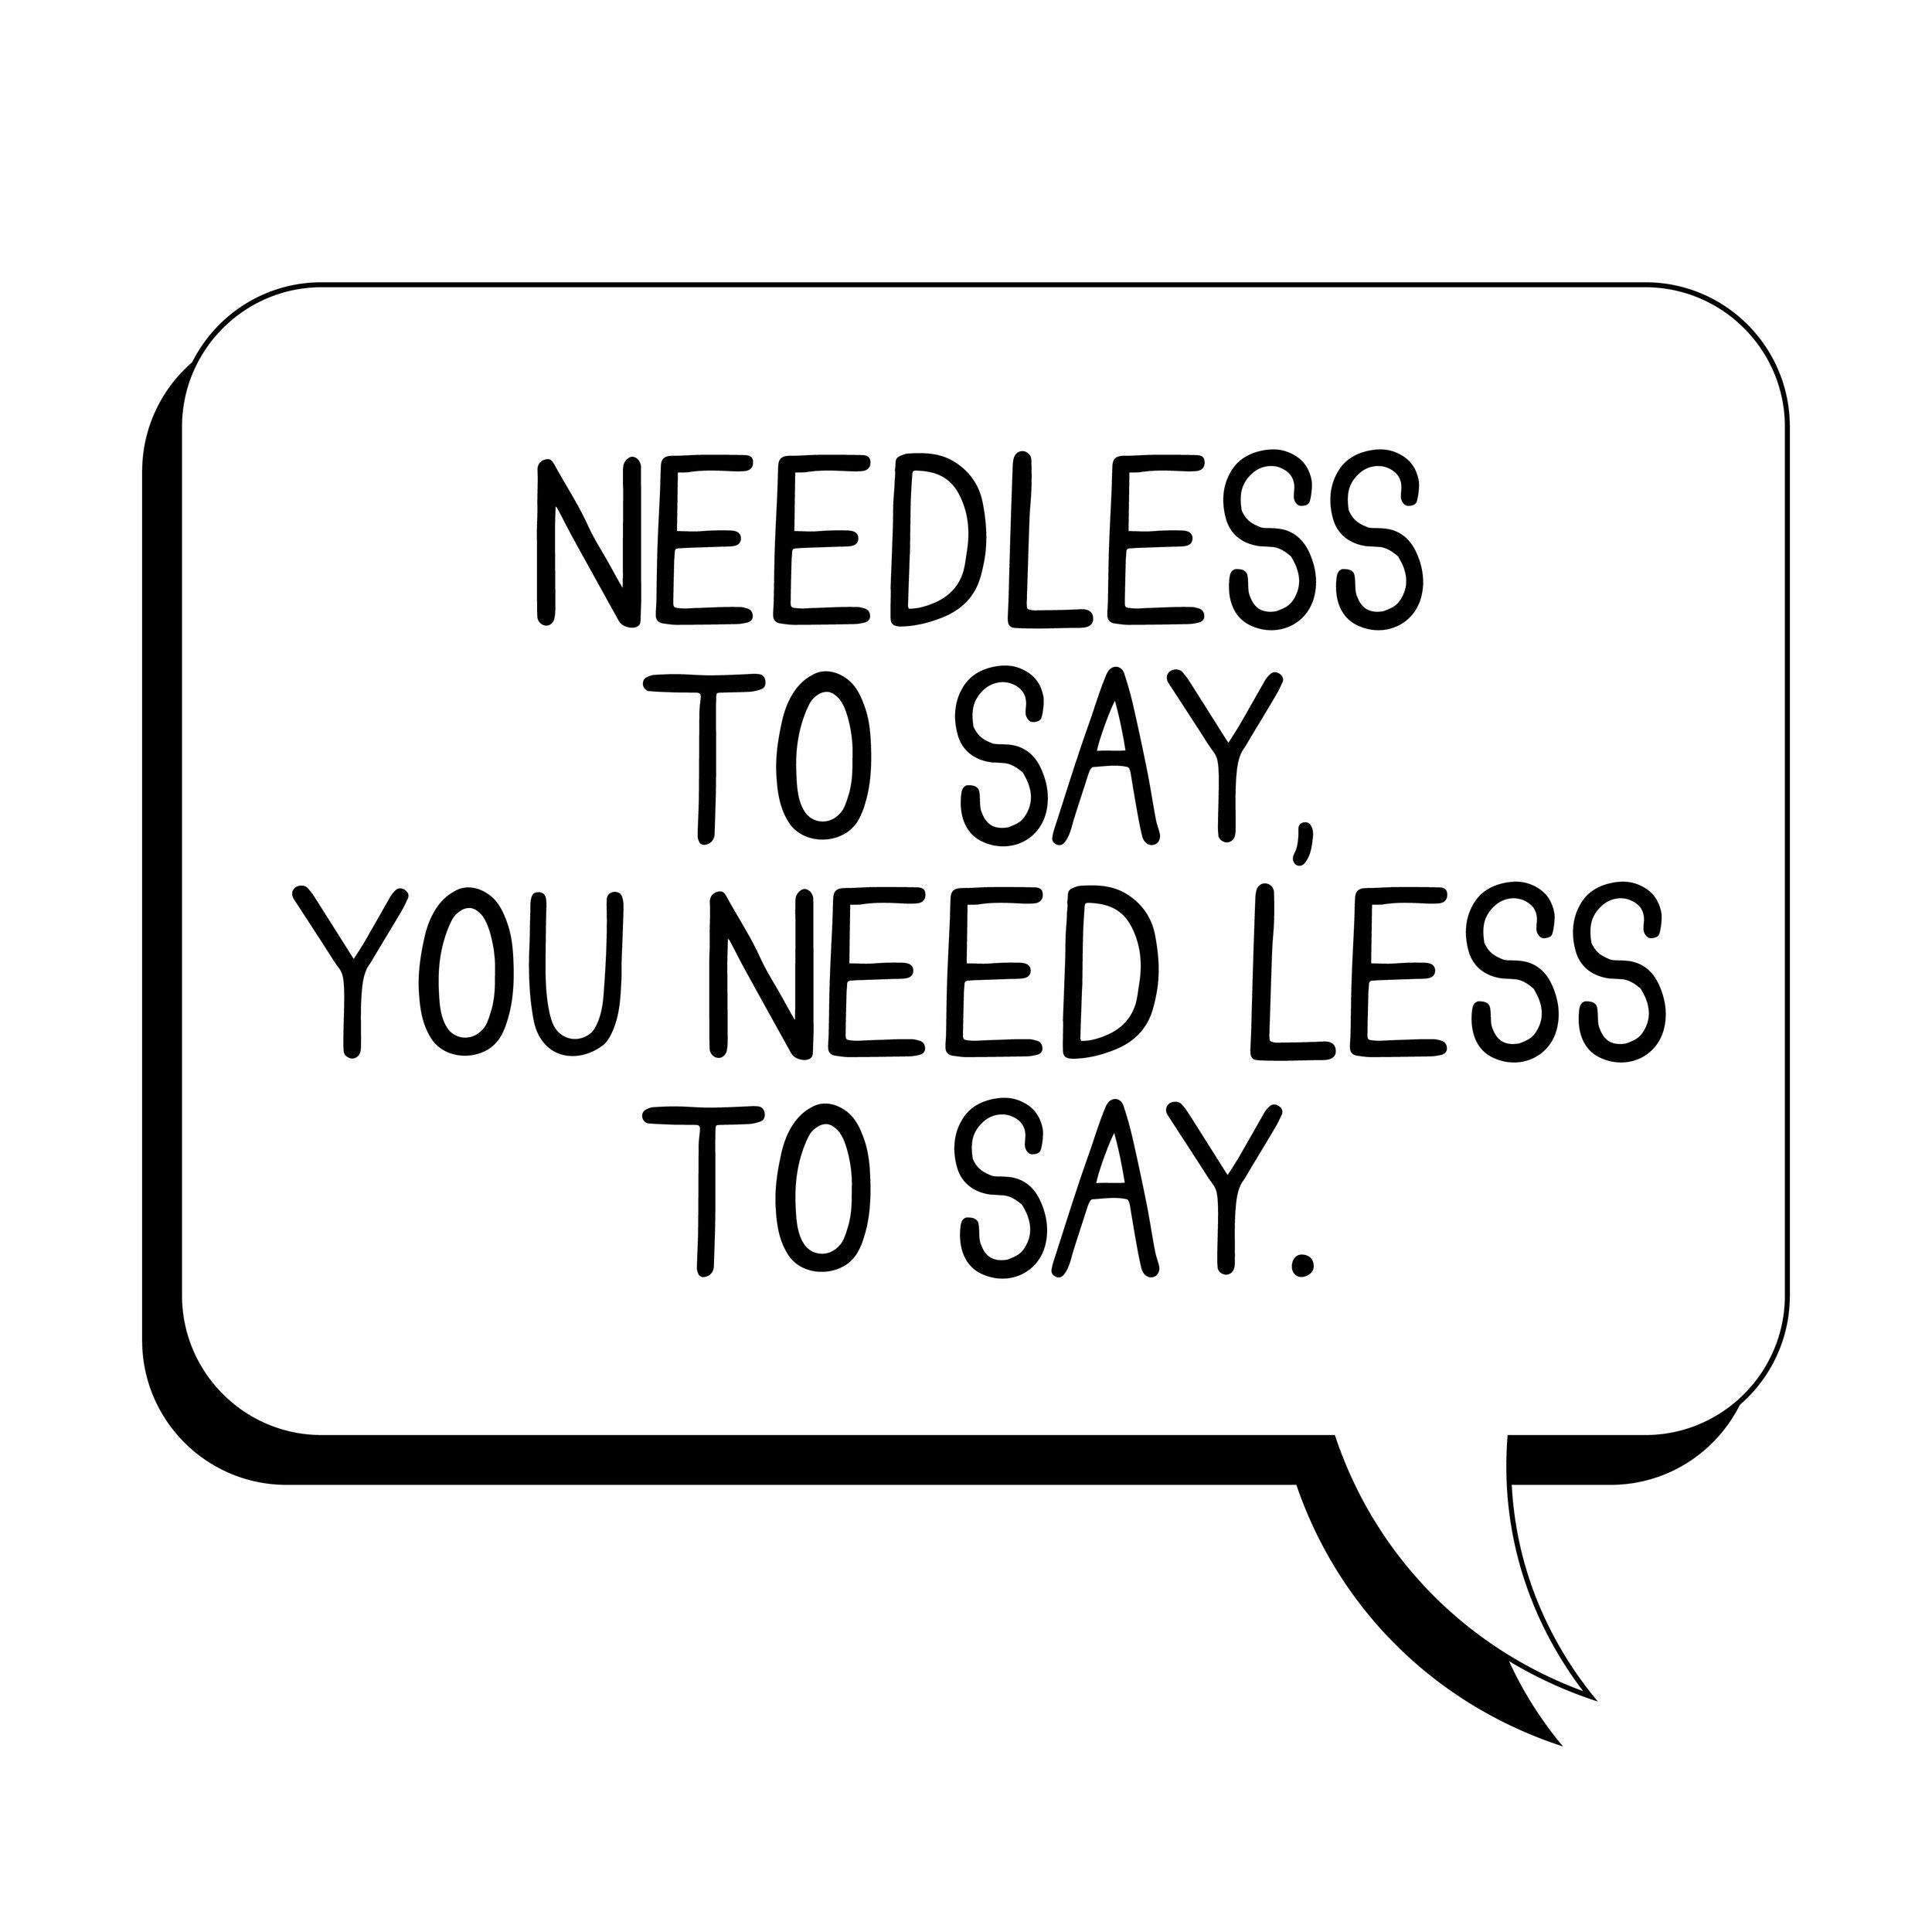 needless-01.jpg